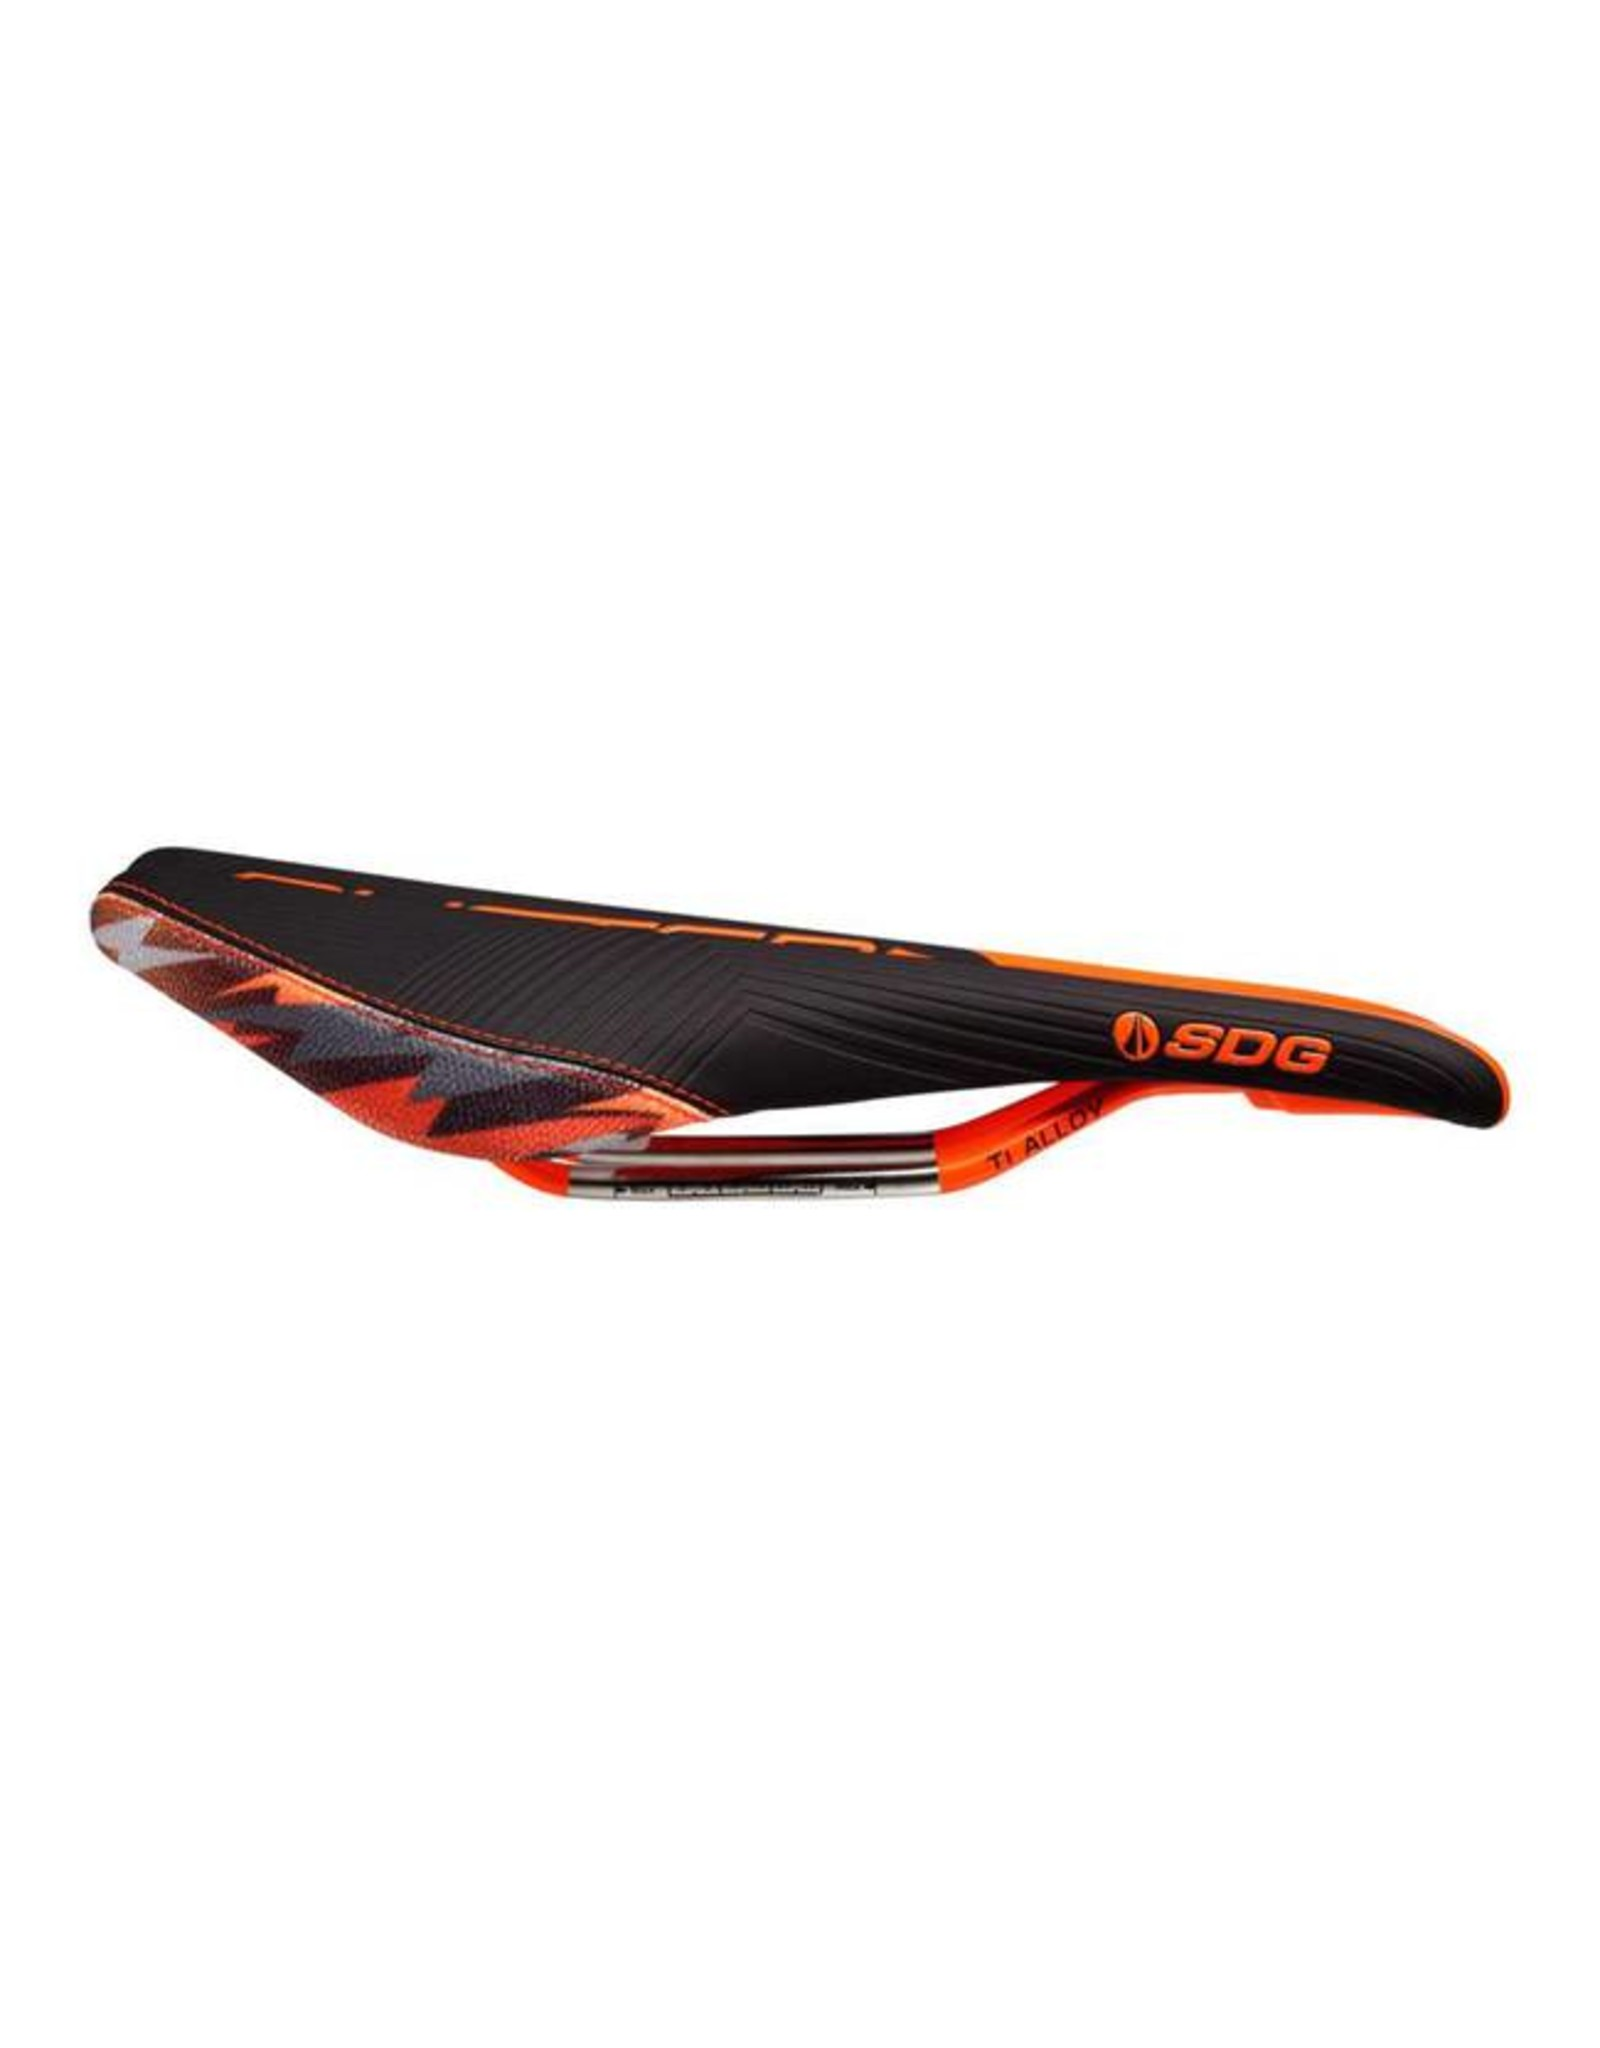 SDG SDG Duster P MTN Camo Bolt Saddle: Ti-Alloy Rails, Black Microfiber Top with Sublimated Orange Camo Kevlar Sides